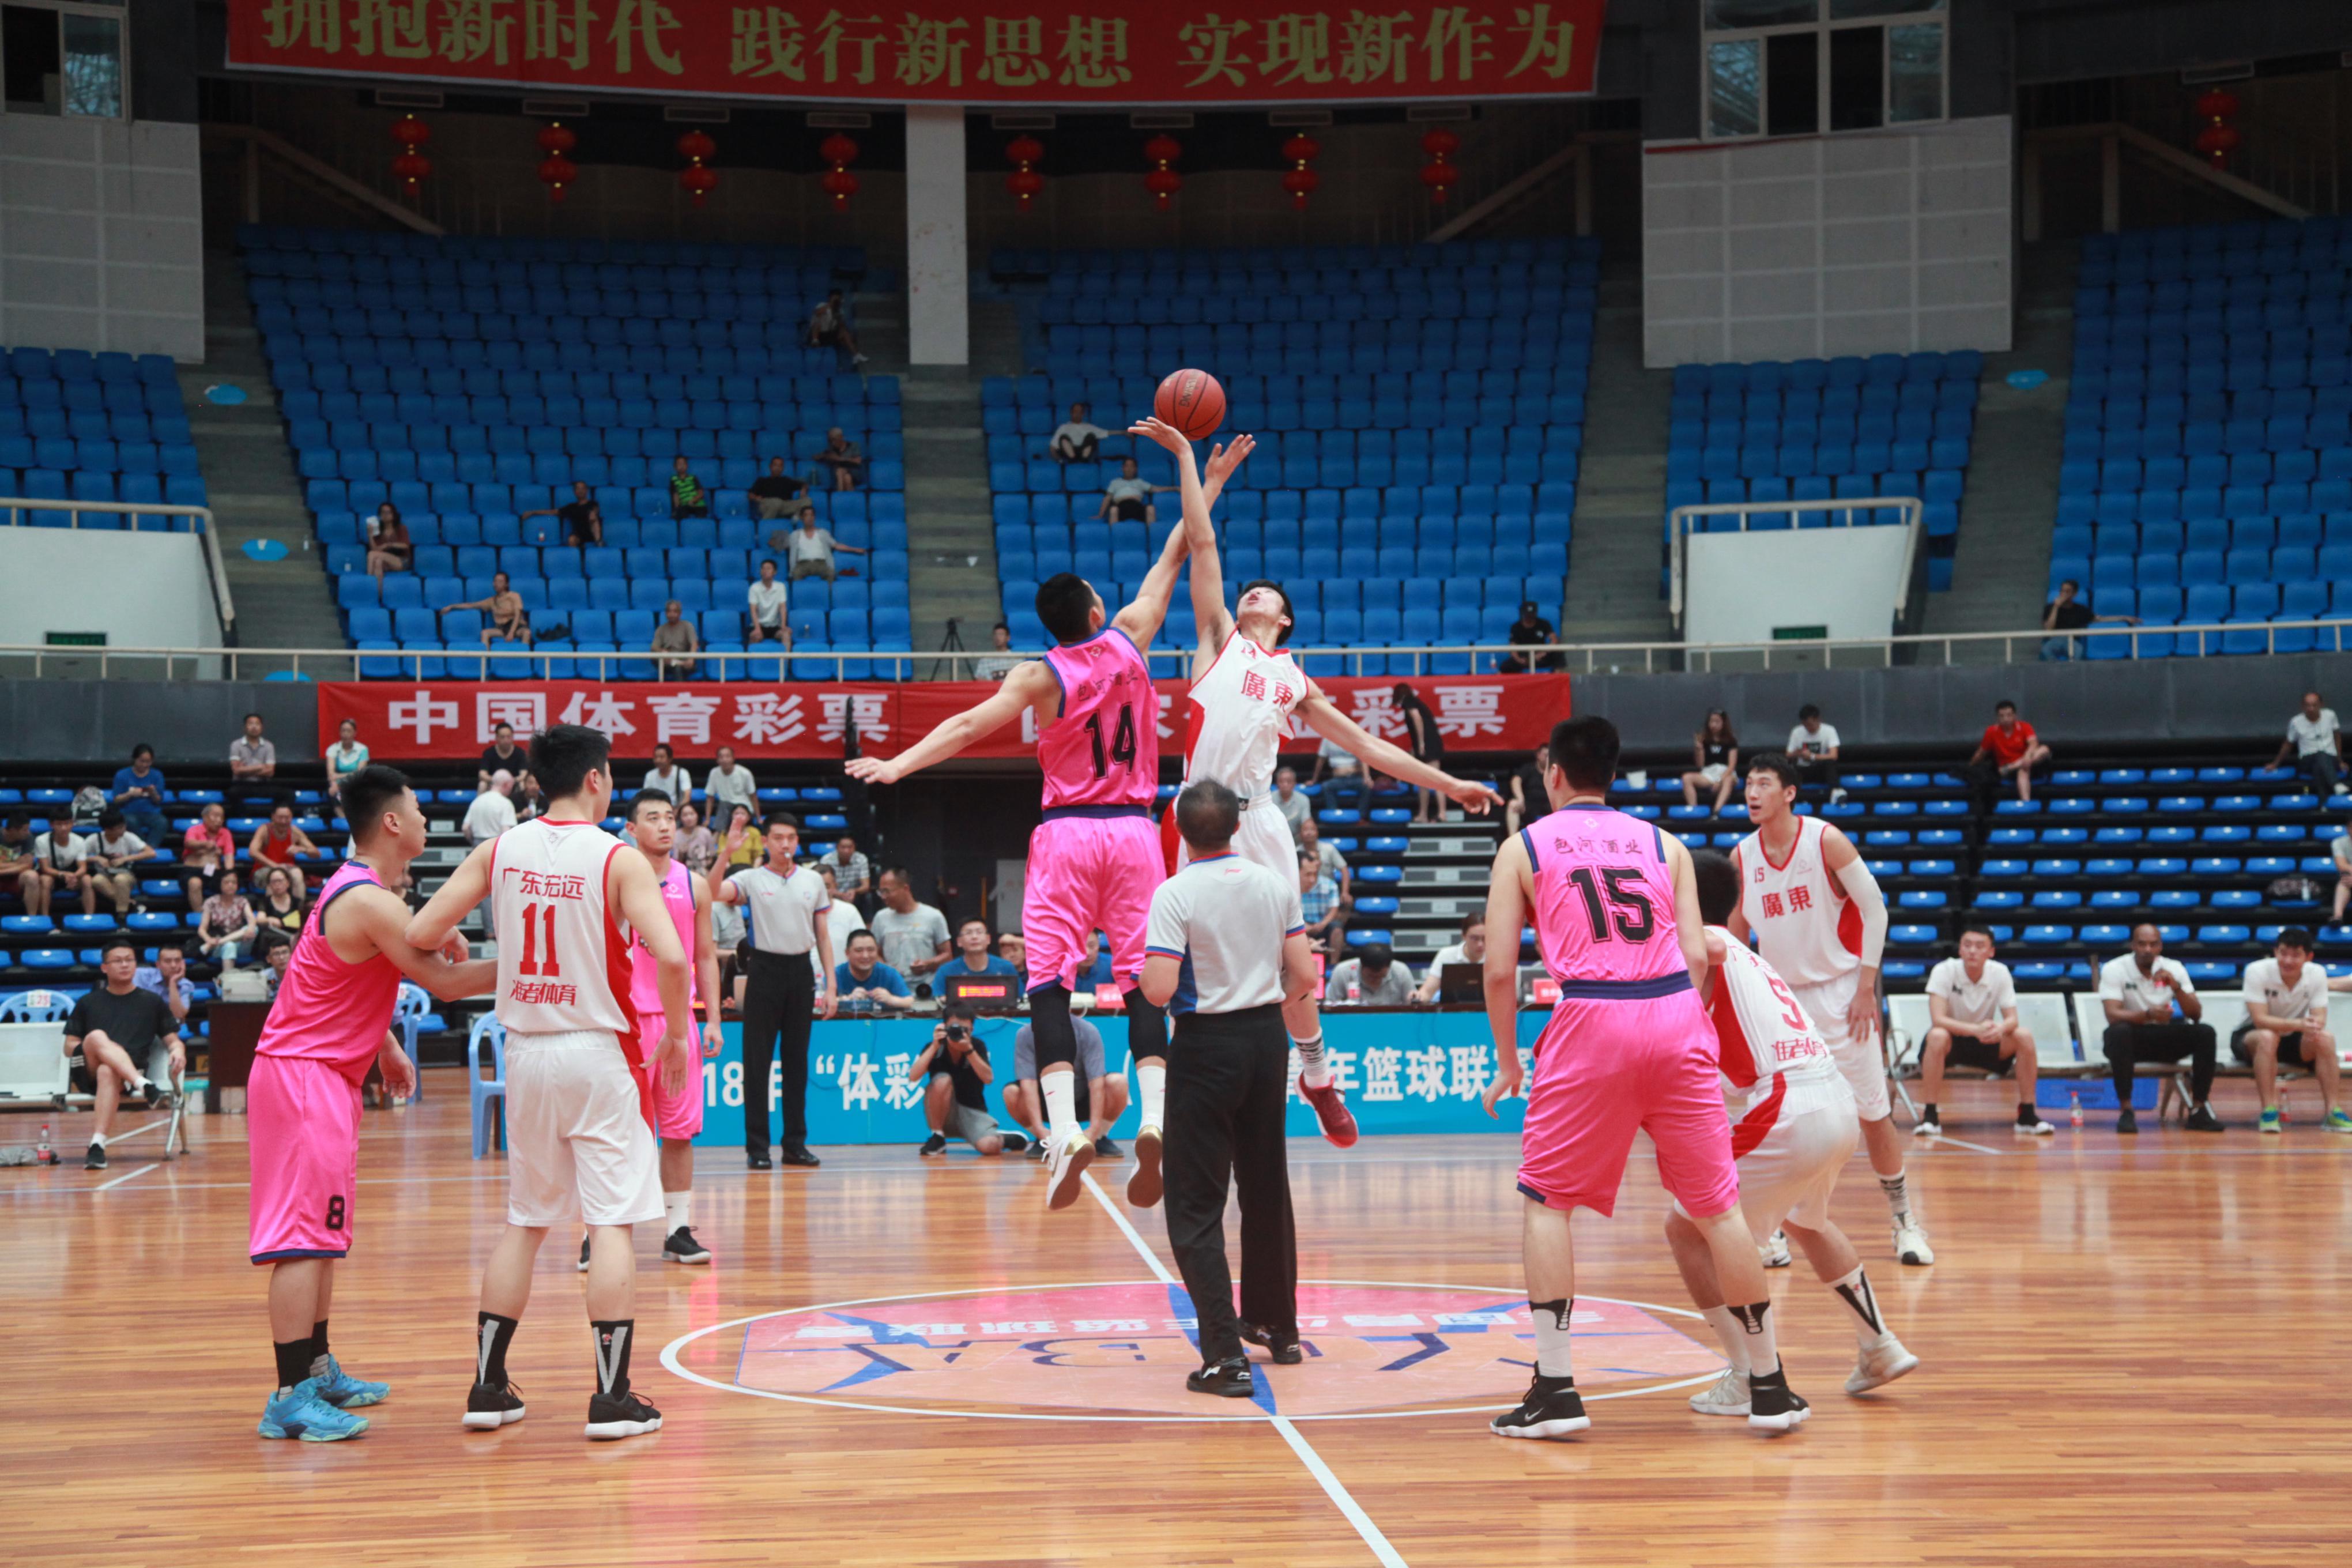 U19男篮赛第2阶段-广厦夺预赛头名 川皖粤列其后